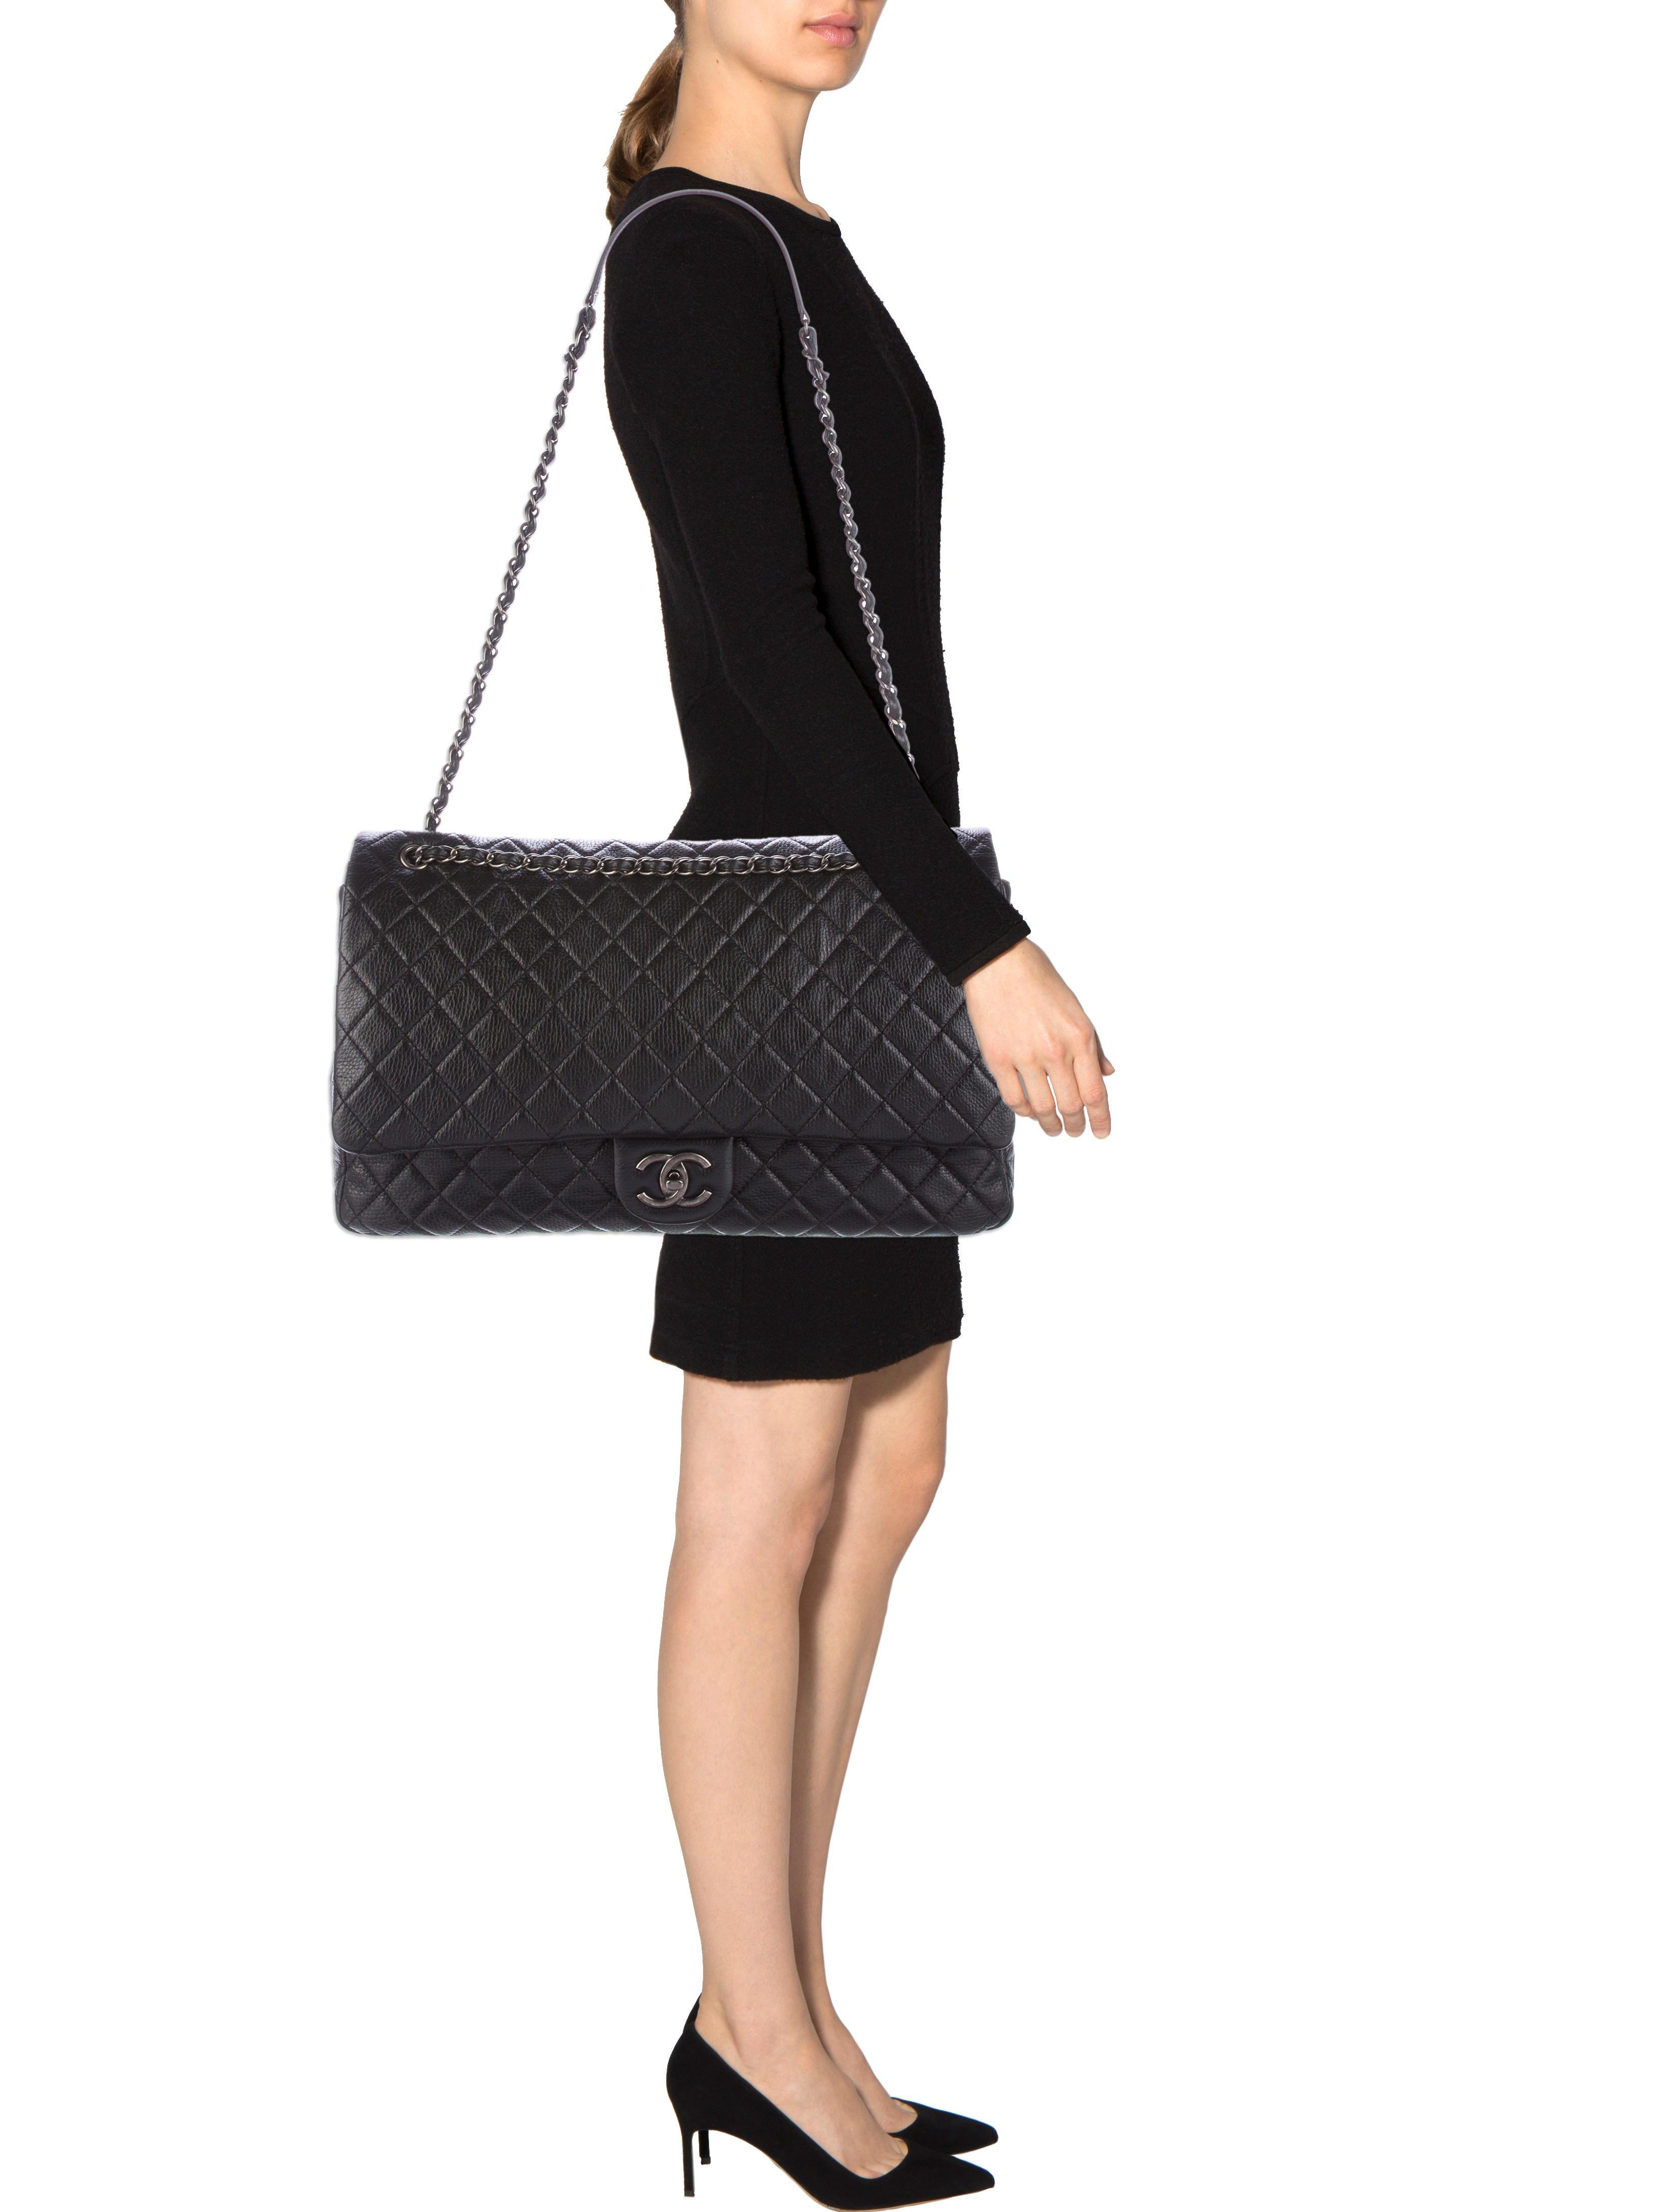 Chanel 2016 Xxl Airline Classic Flap Bag Handbags Cha173452 The Realreal